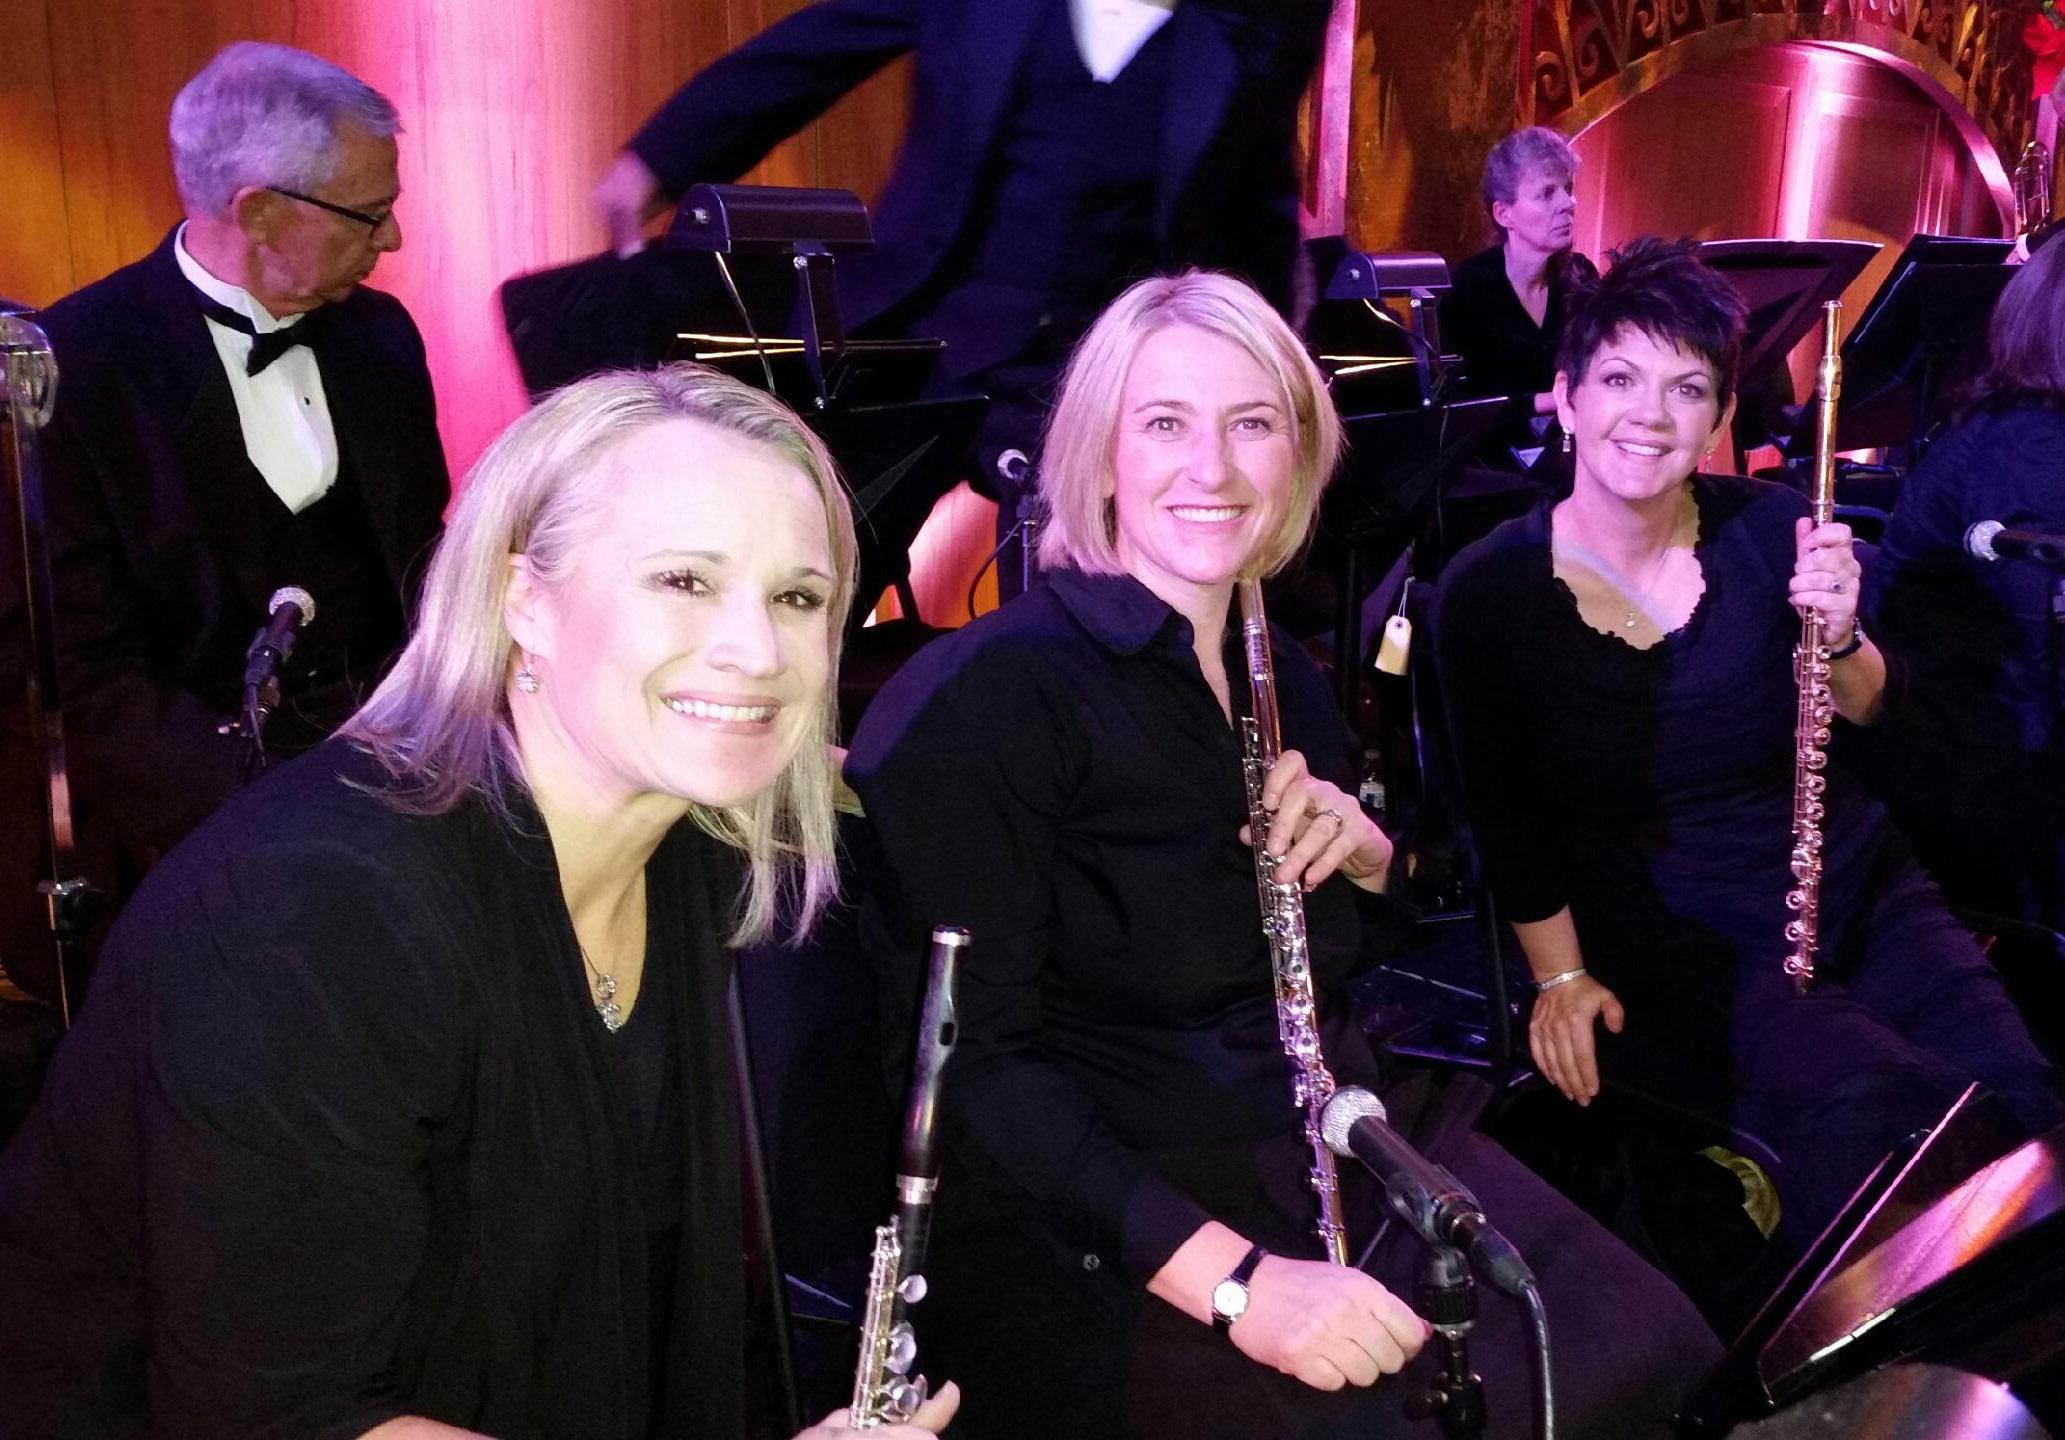 Concert Performance - Flutes - Jeannine Goeckeritz - Tiffany Sedgley - Lisa Whatcott.jpg